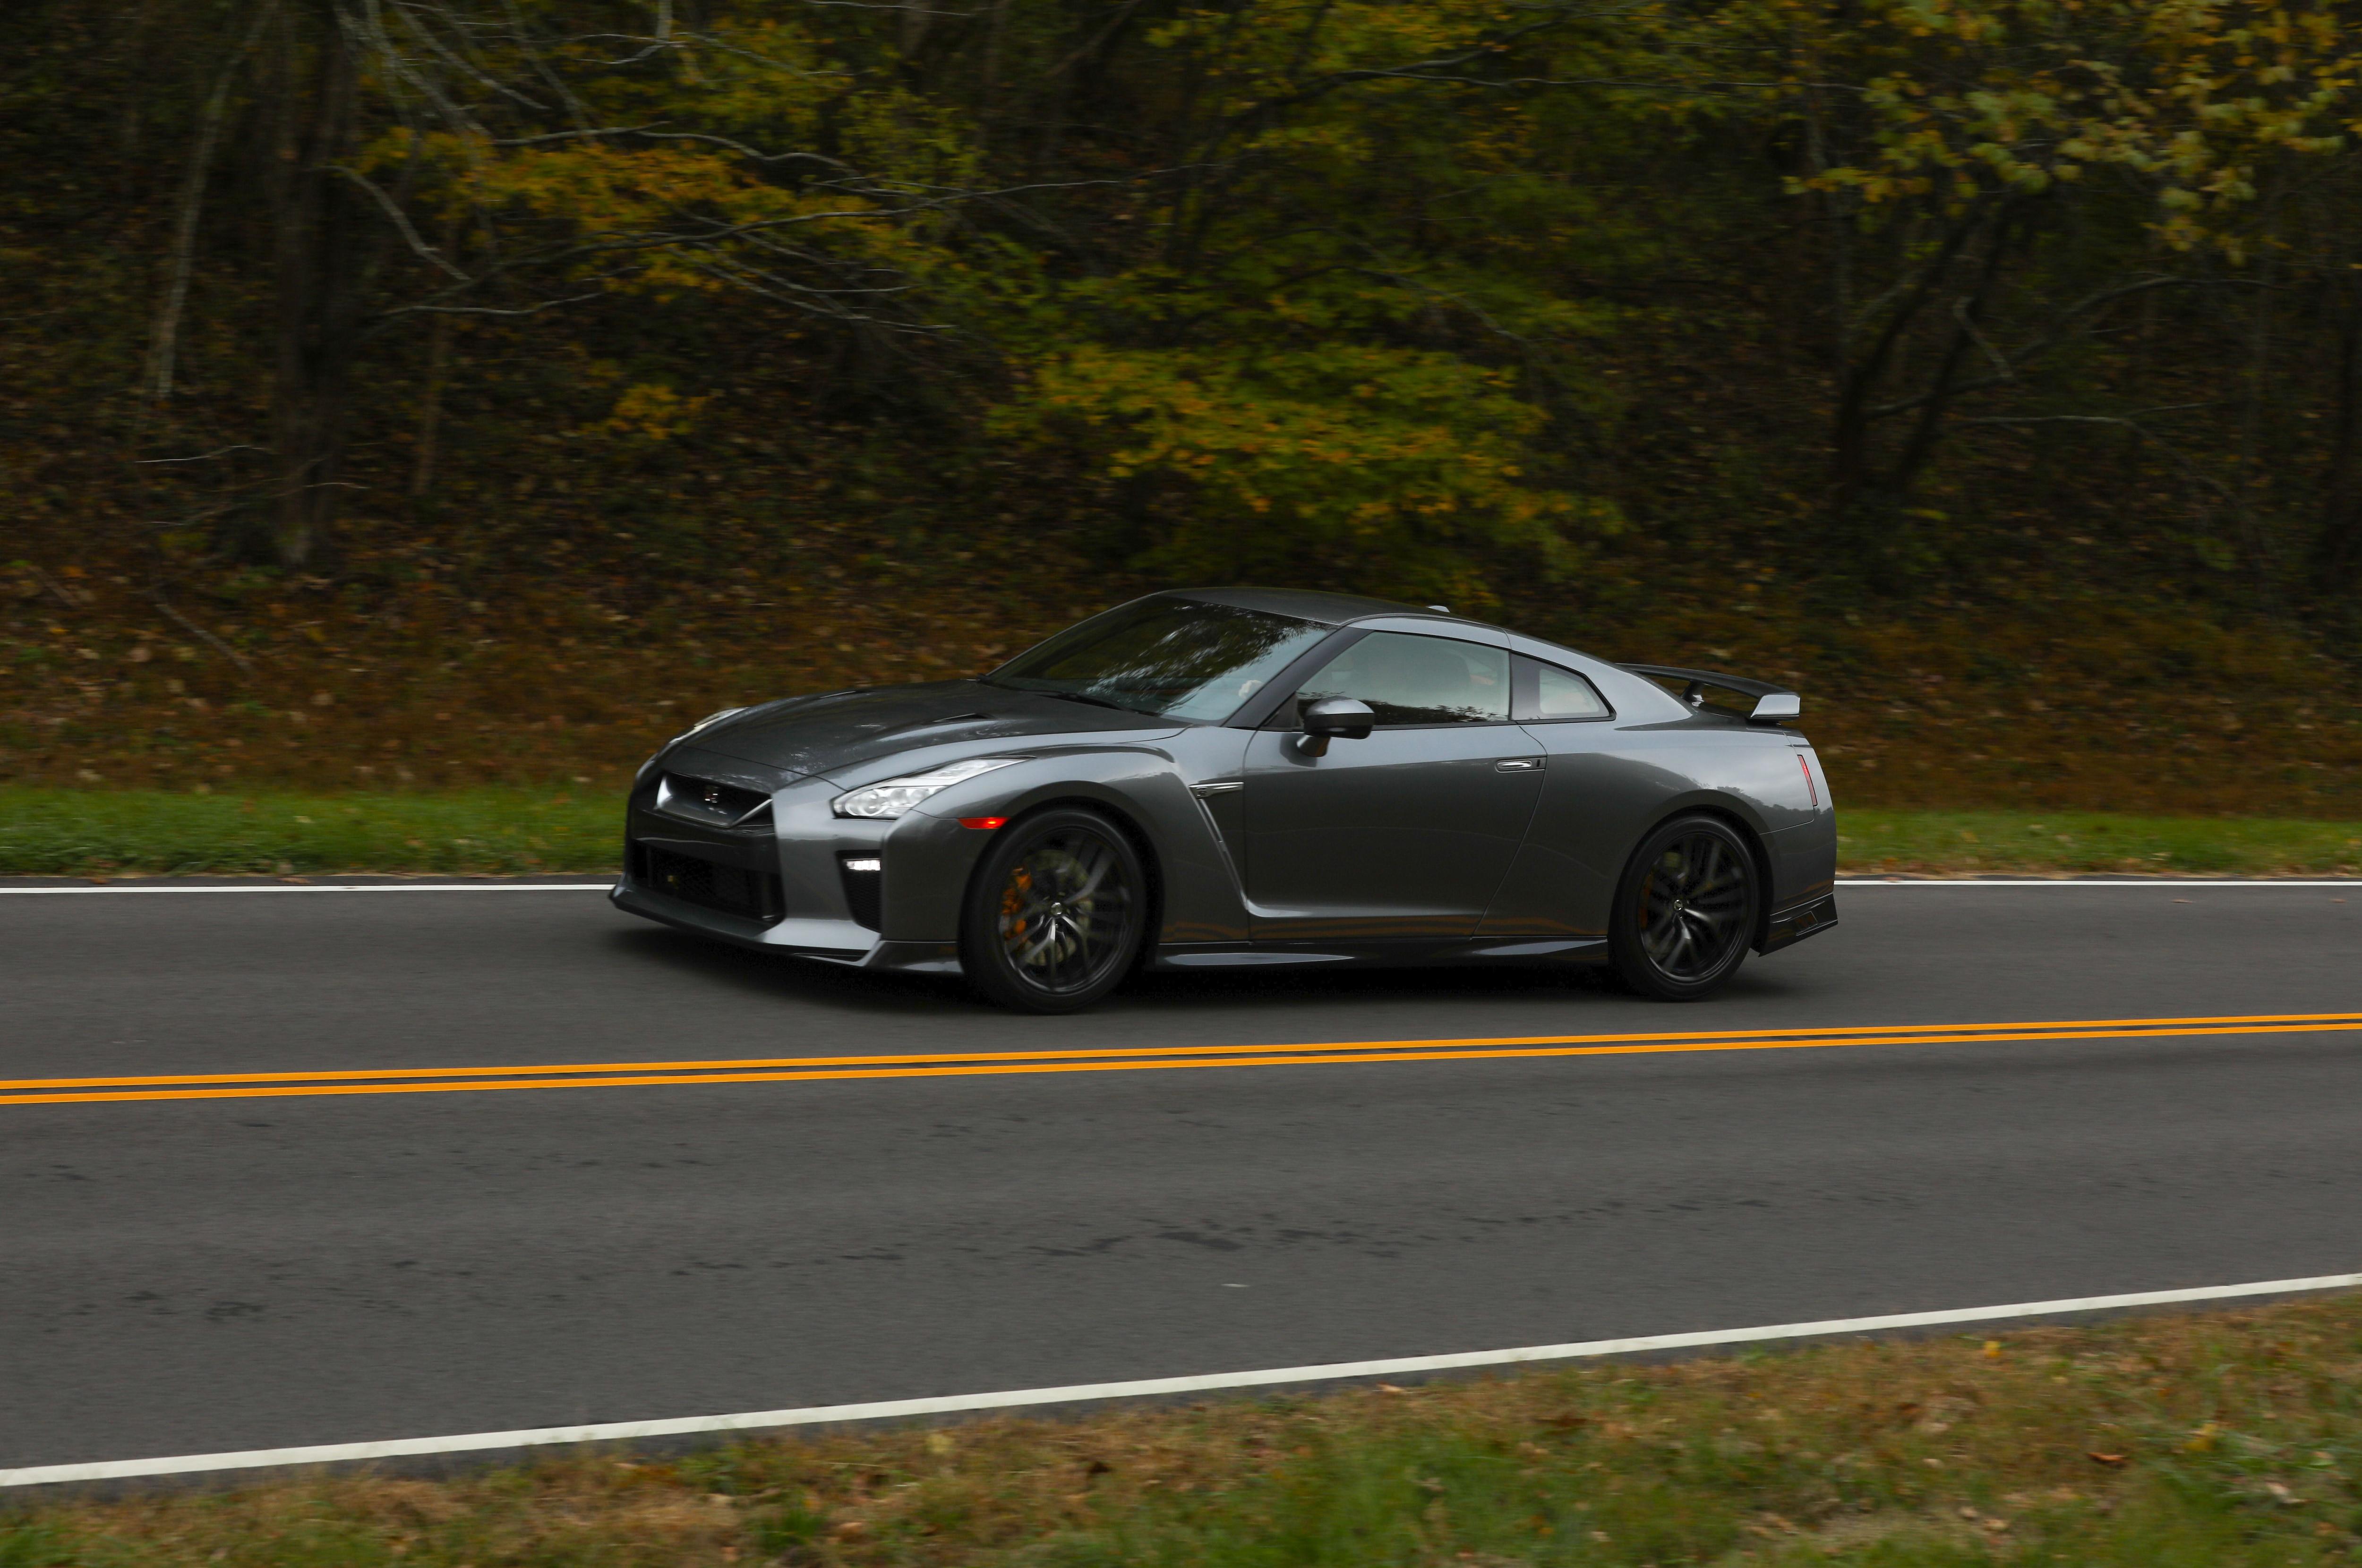 2018 Nissan GT-R Quick Take Review | Automobile Magazine